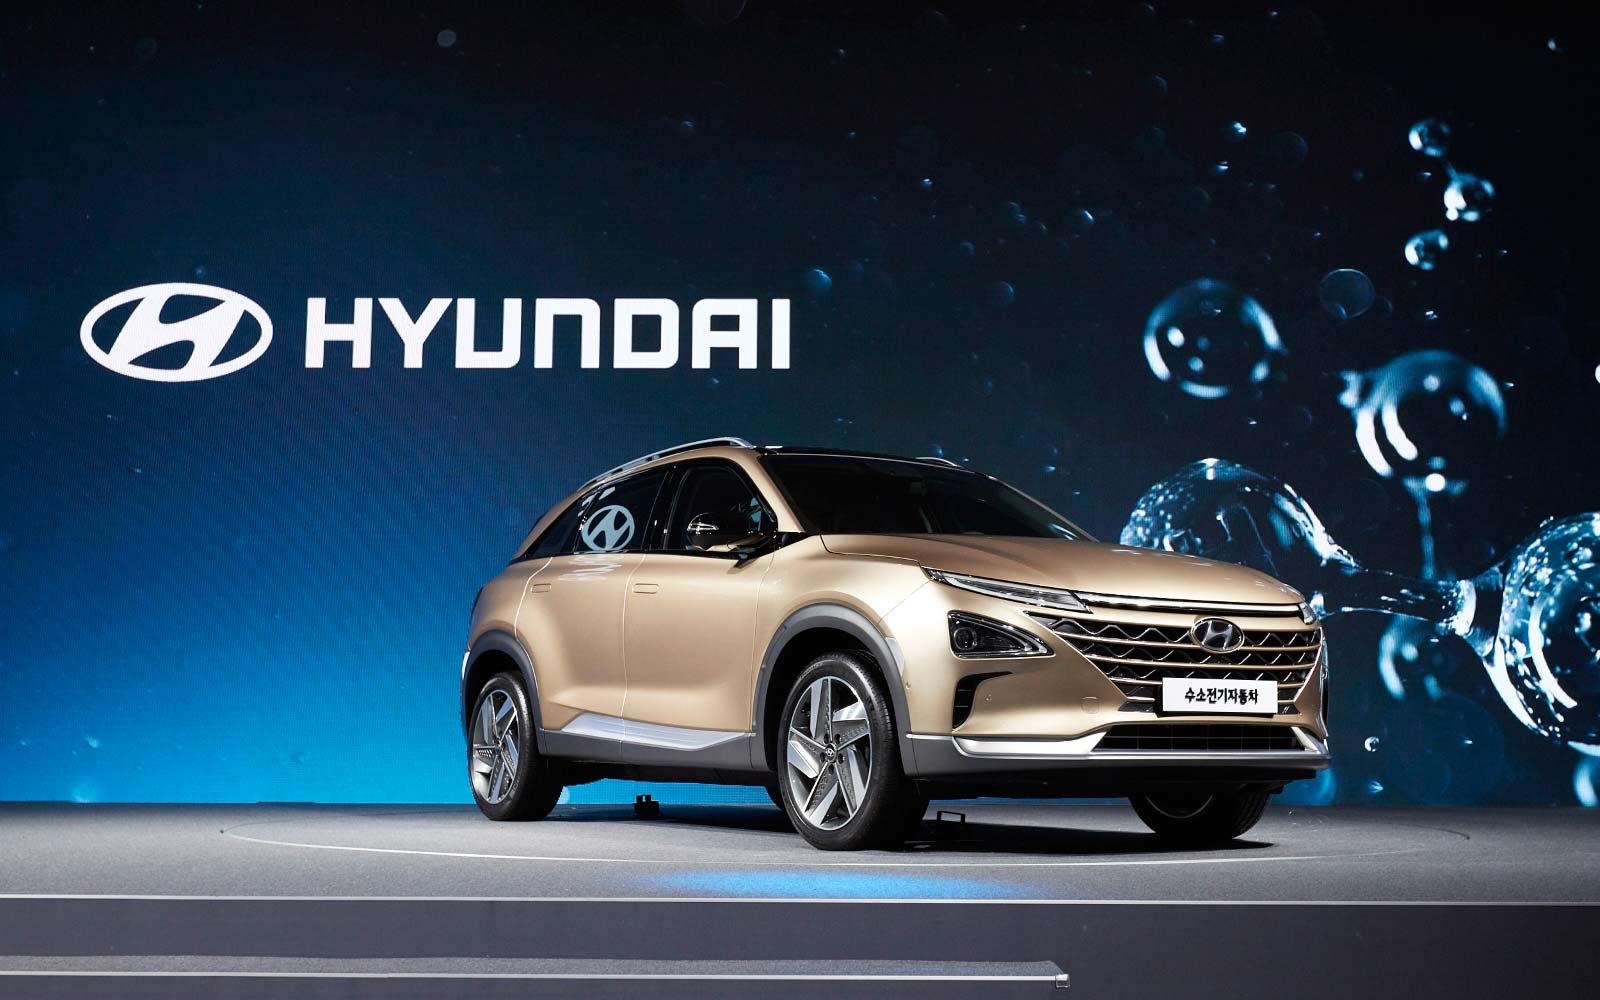 2017-hyundai-next-gen-fuel-cell-suv_3